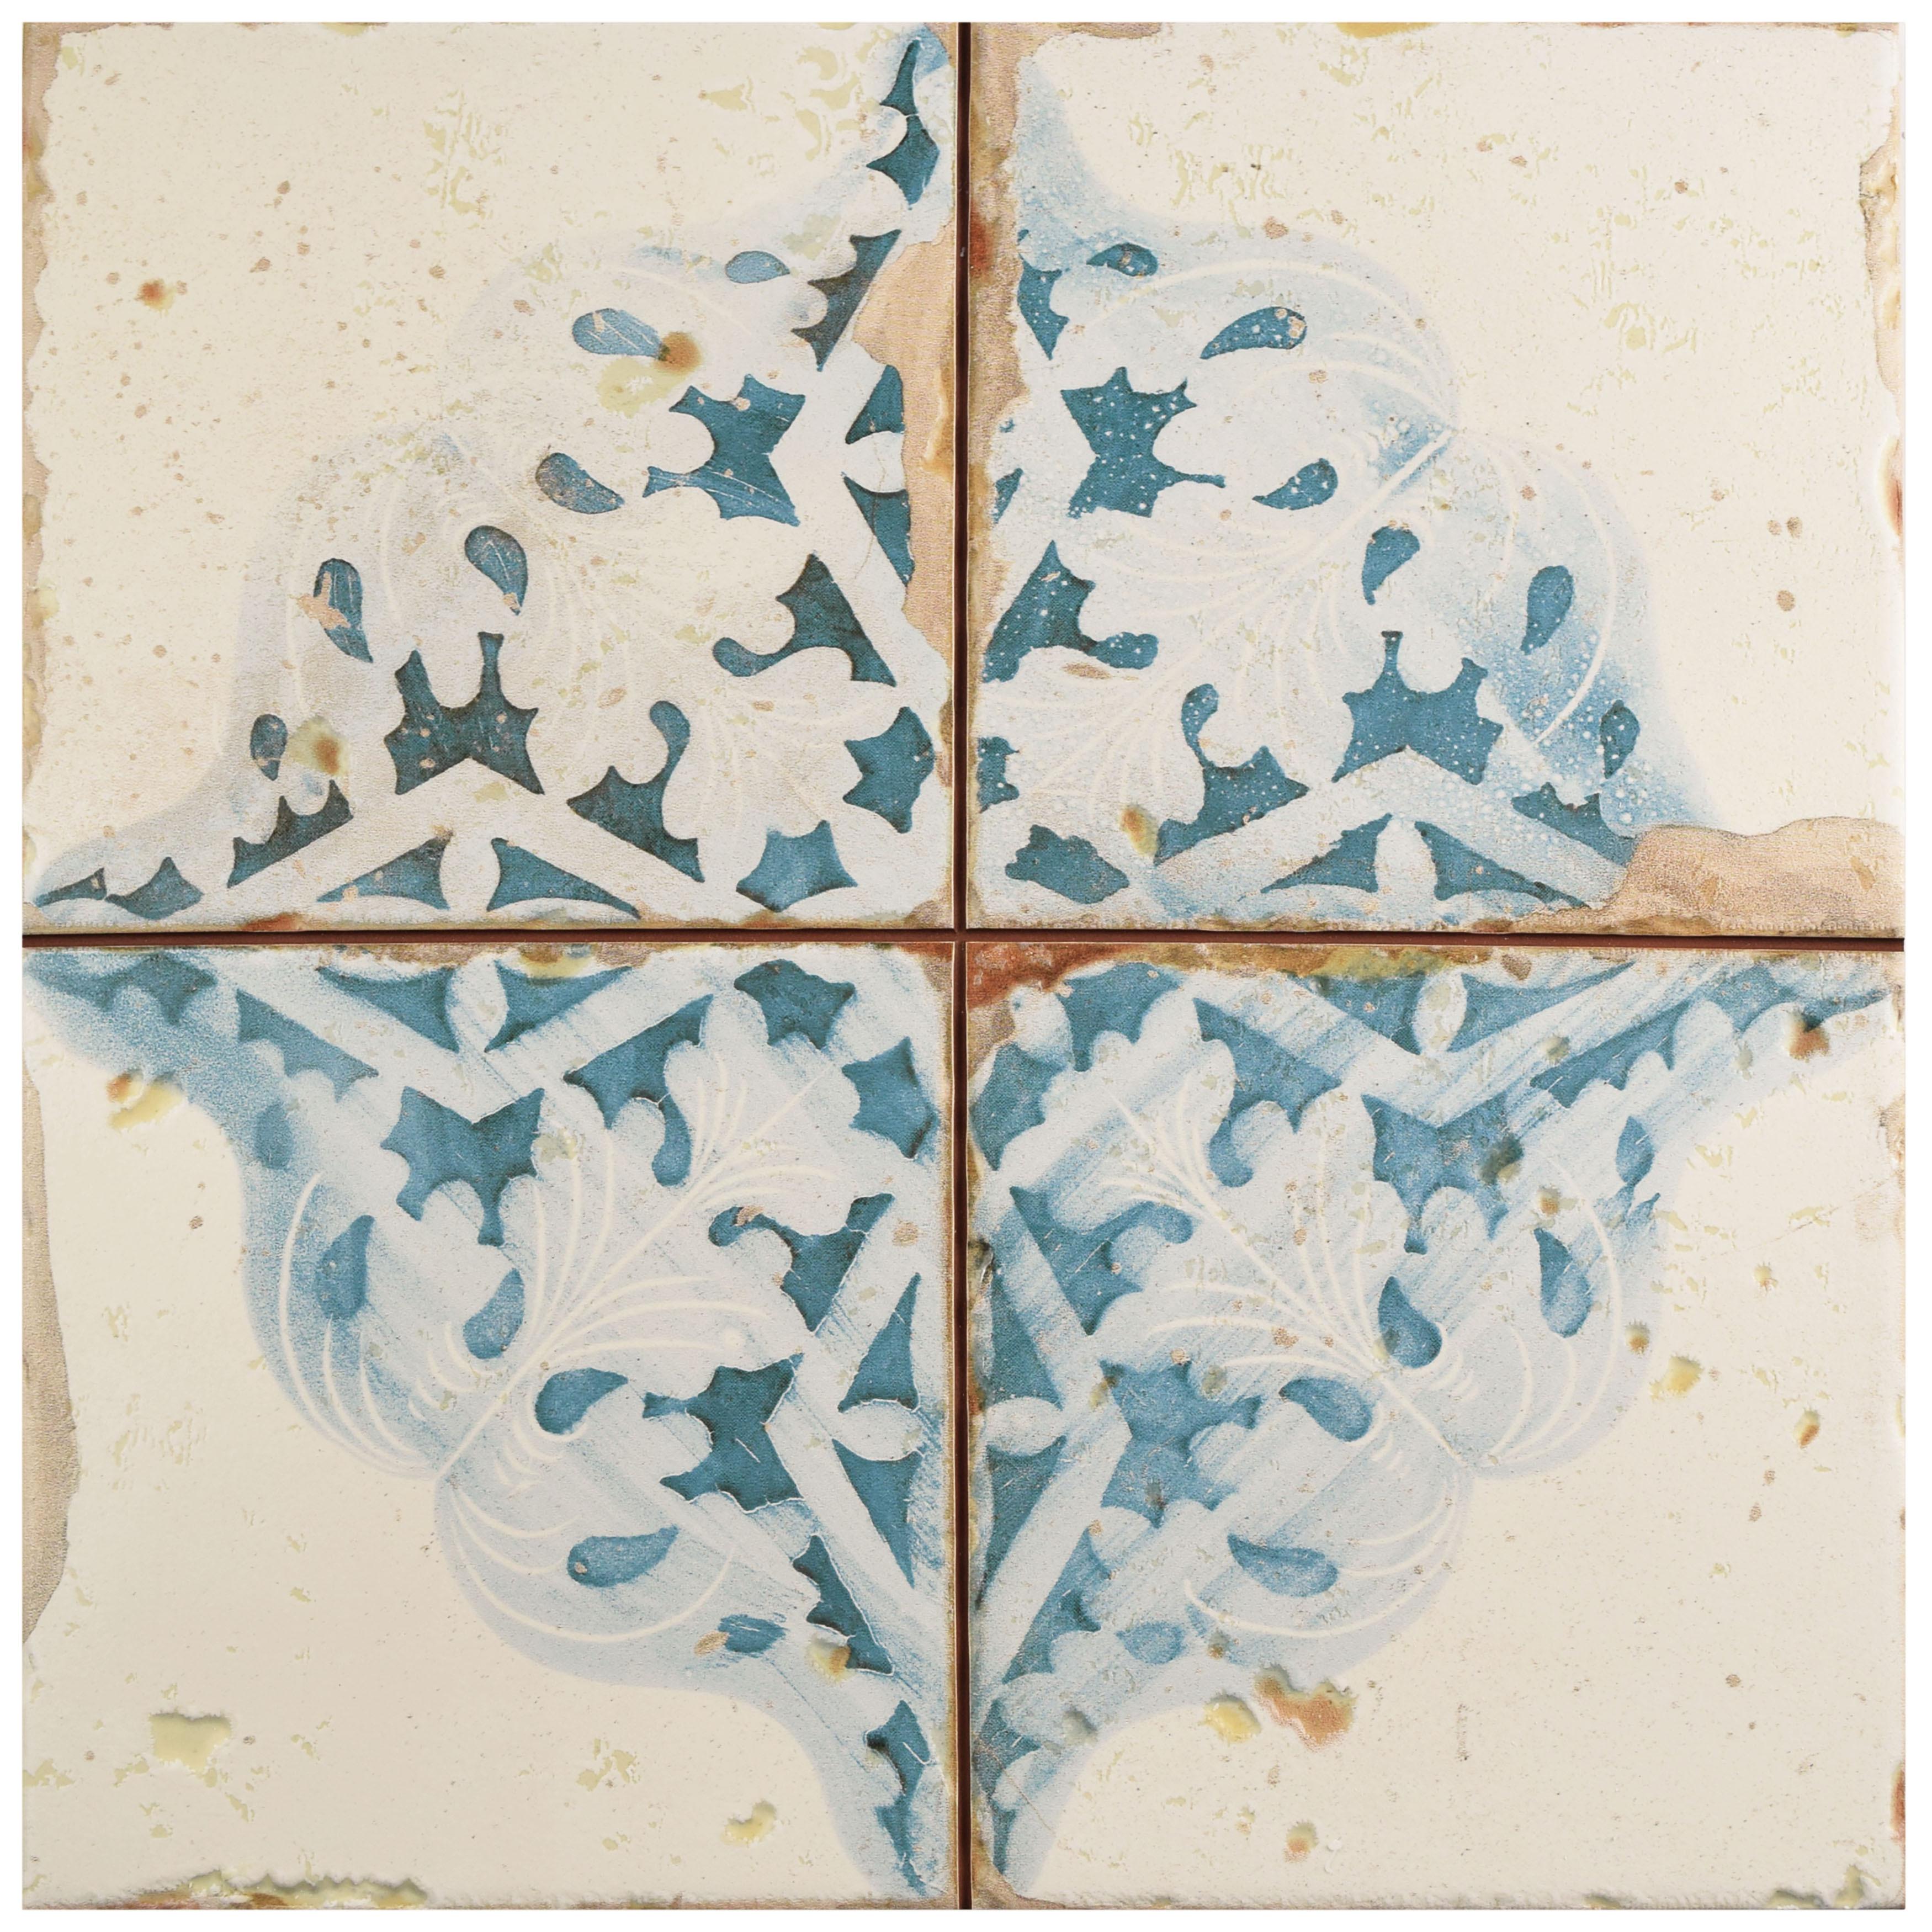 Very Goods Somertile 13x13 Inch Artesano Azul Dcor Ceramic Floor